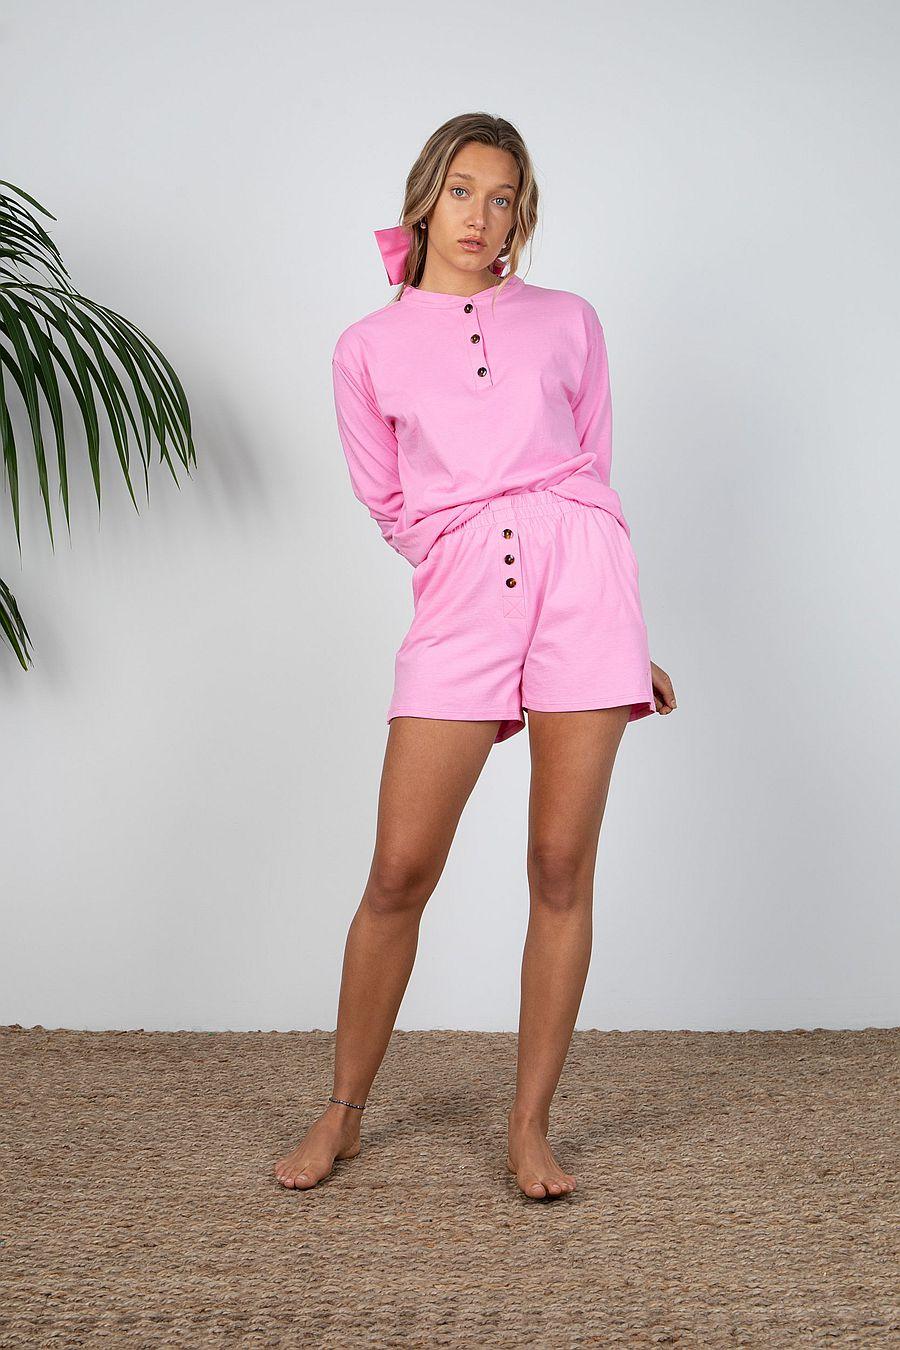 DONNI. Henley Tee - Flamingo